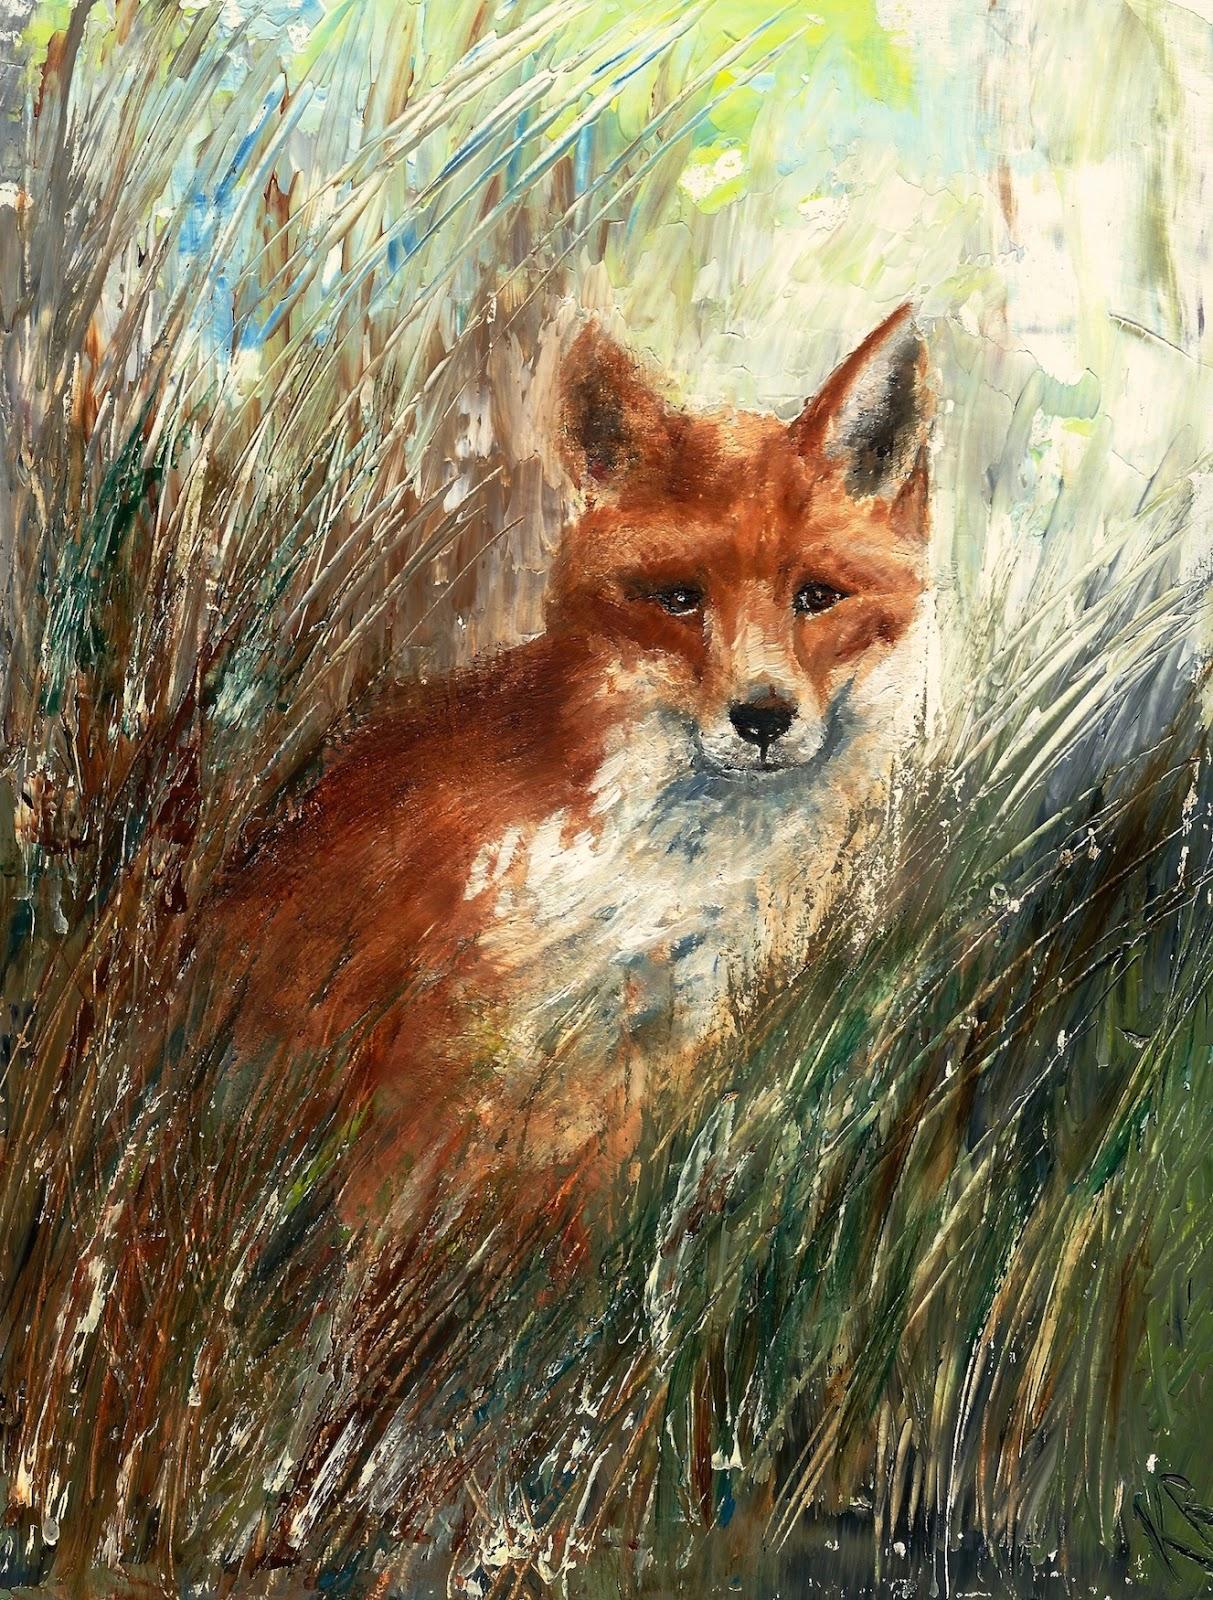 Fox hiding in grass, an oil painting, palette knife painting, a pet portrait by Karen